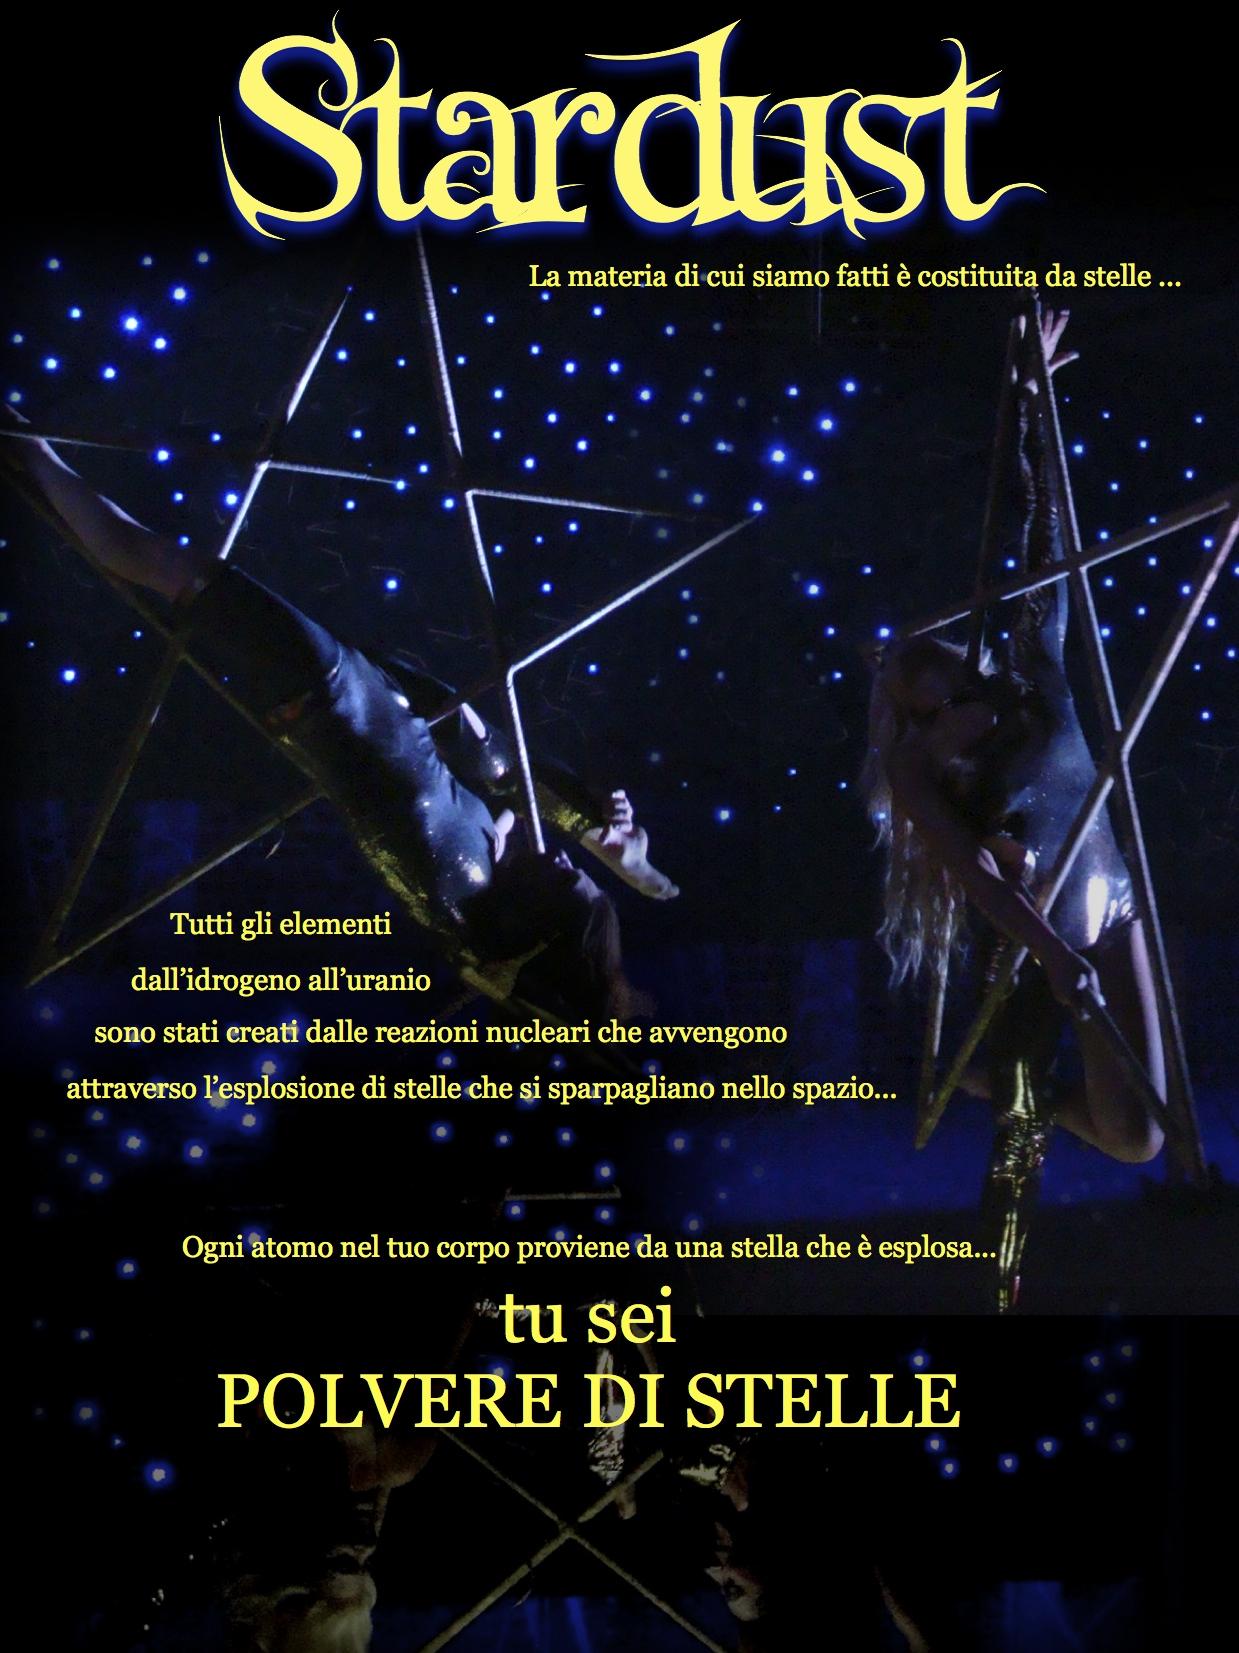 ACROBATI AEREI STARDUST aerial star